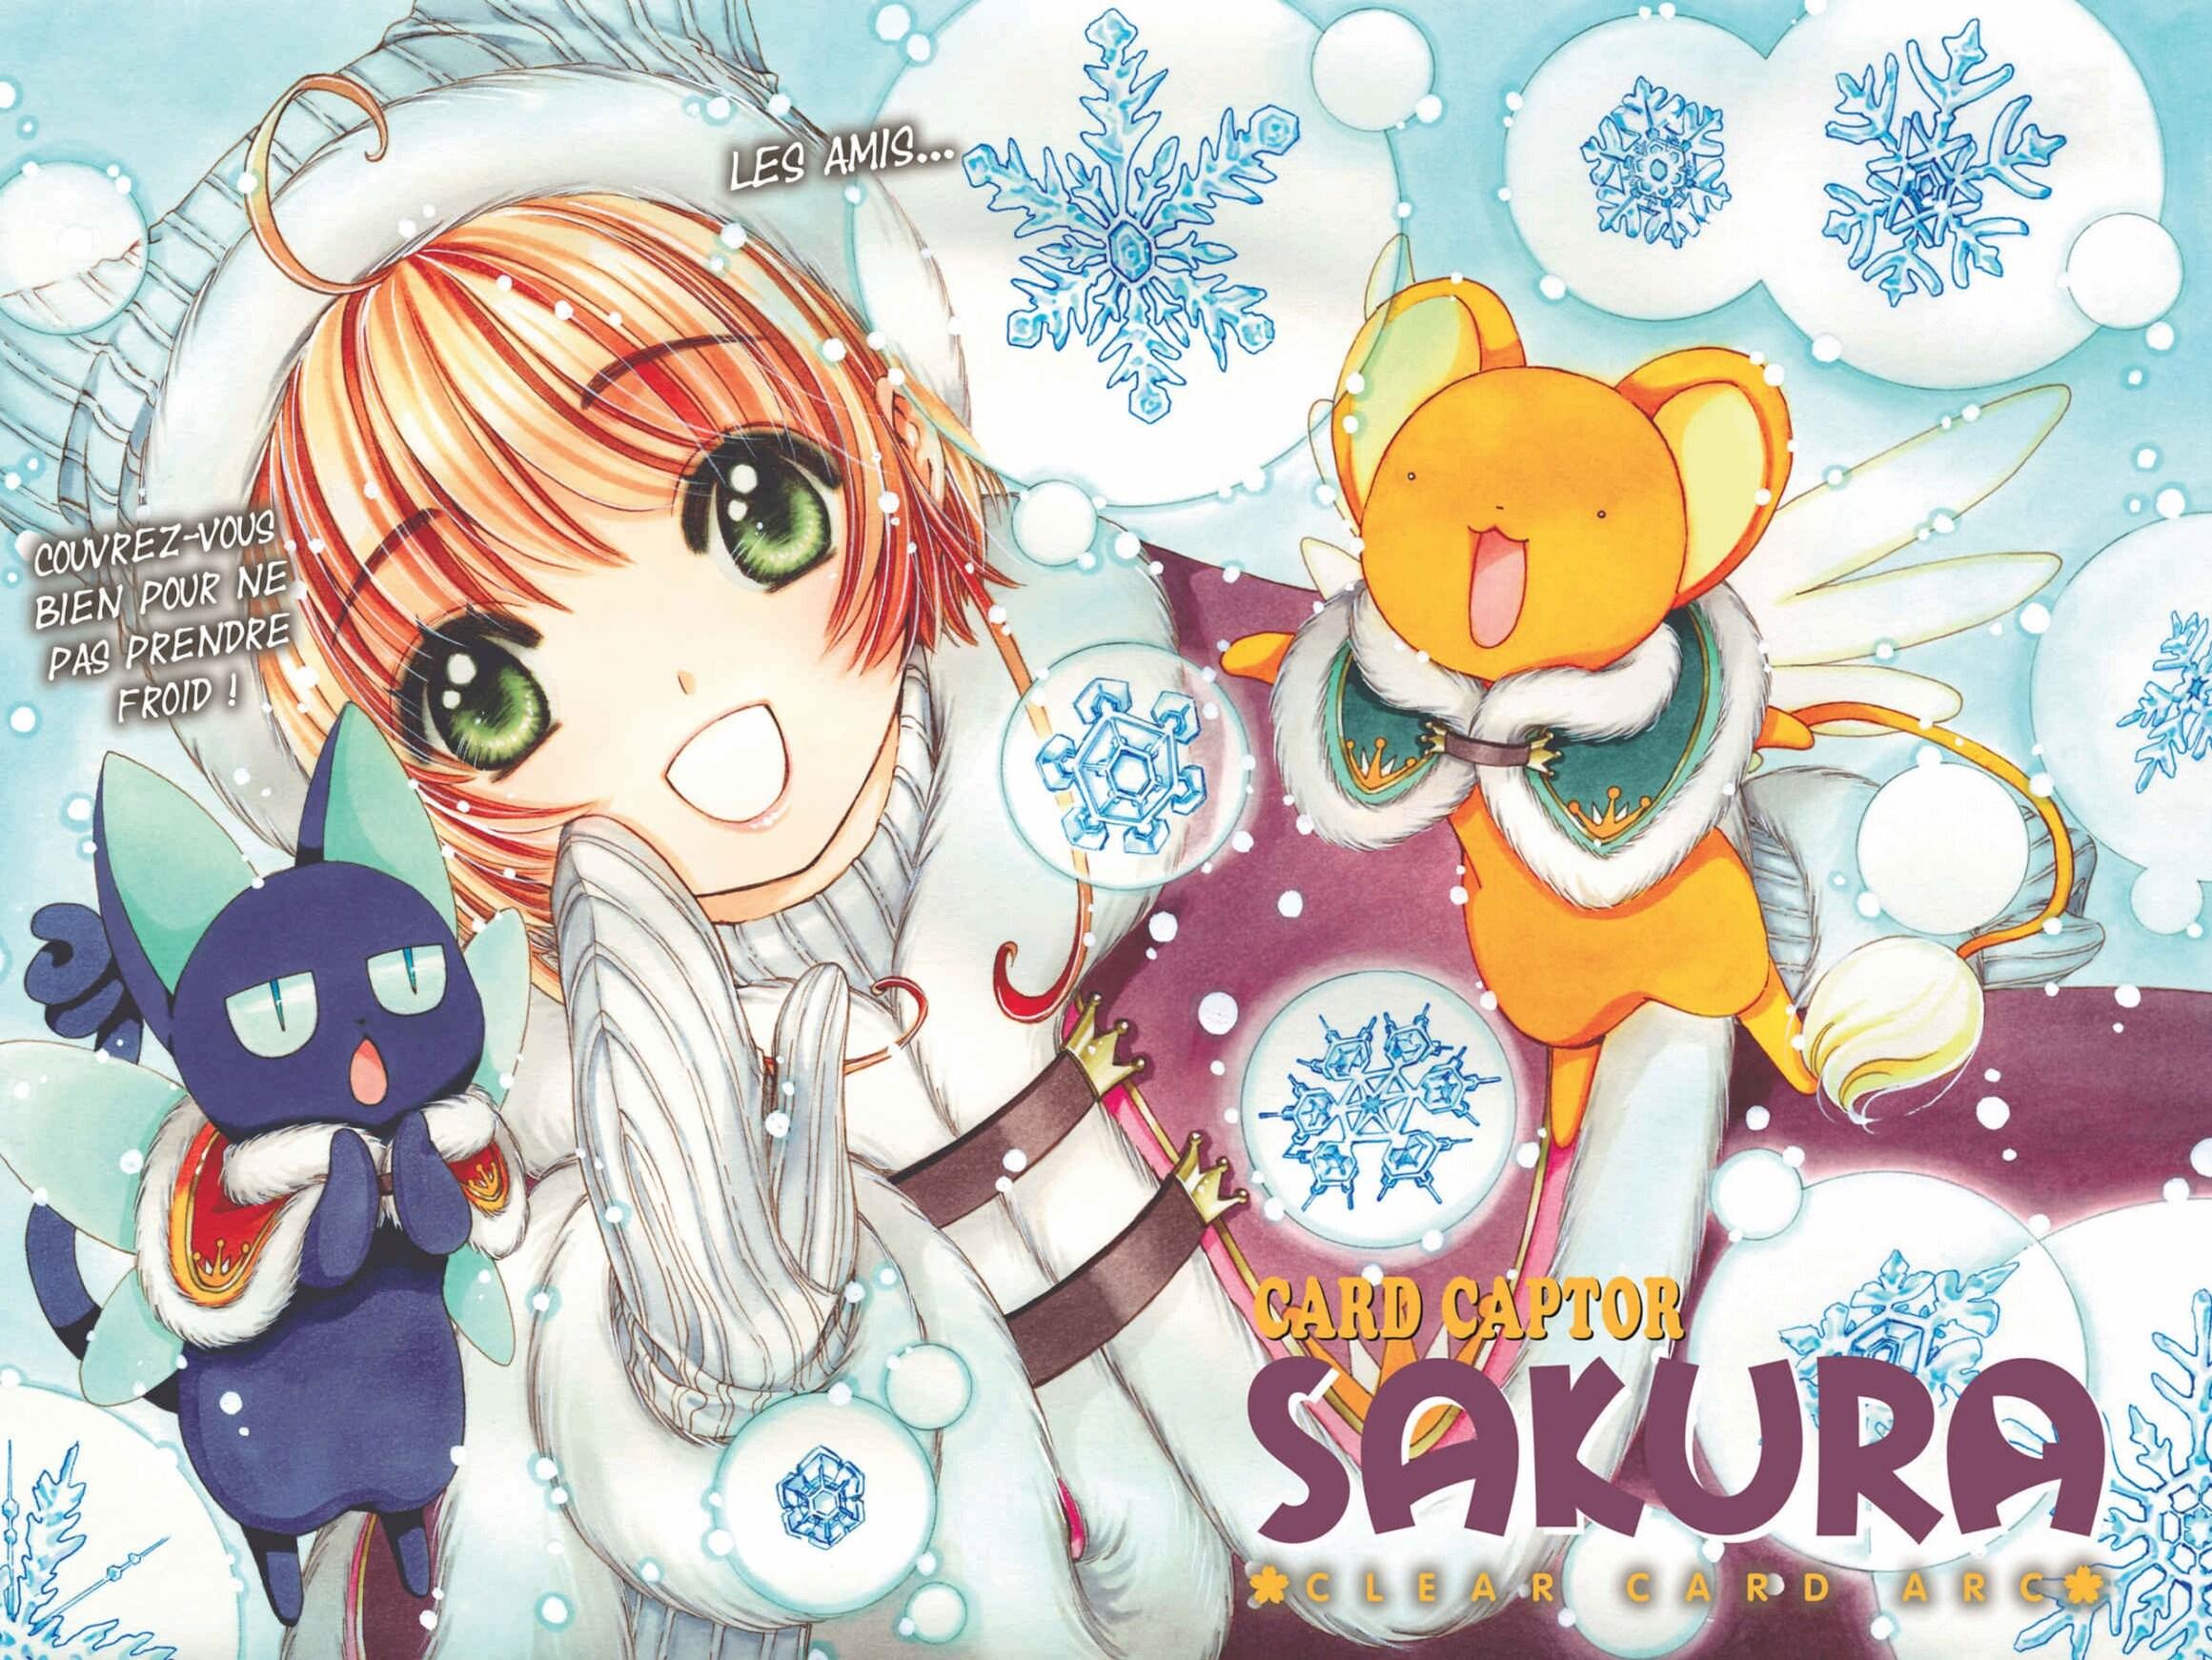 Card Captor Sakura et autres mangas [CLAMP] - Page 41 Cardca12